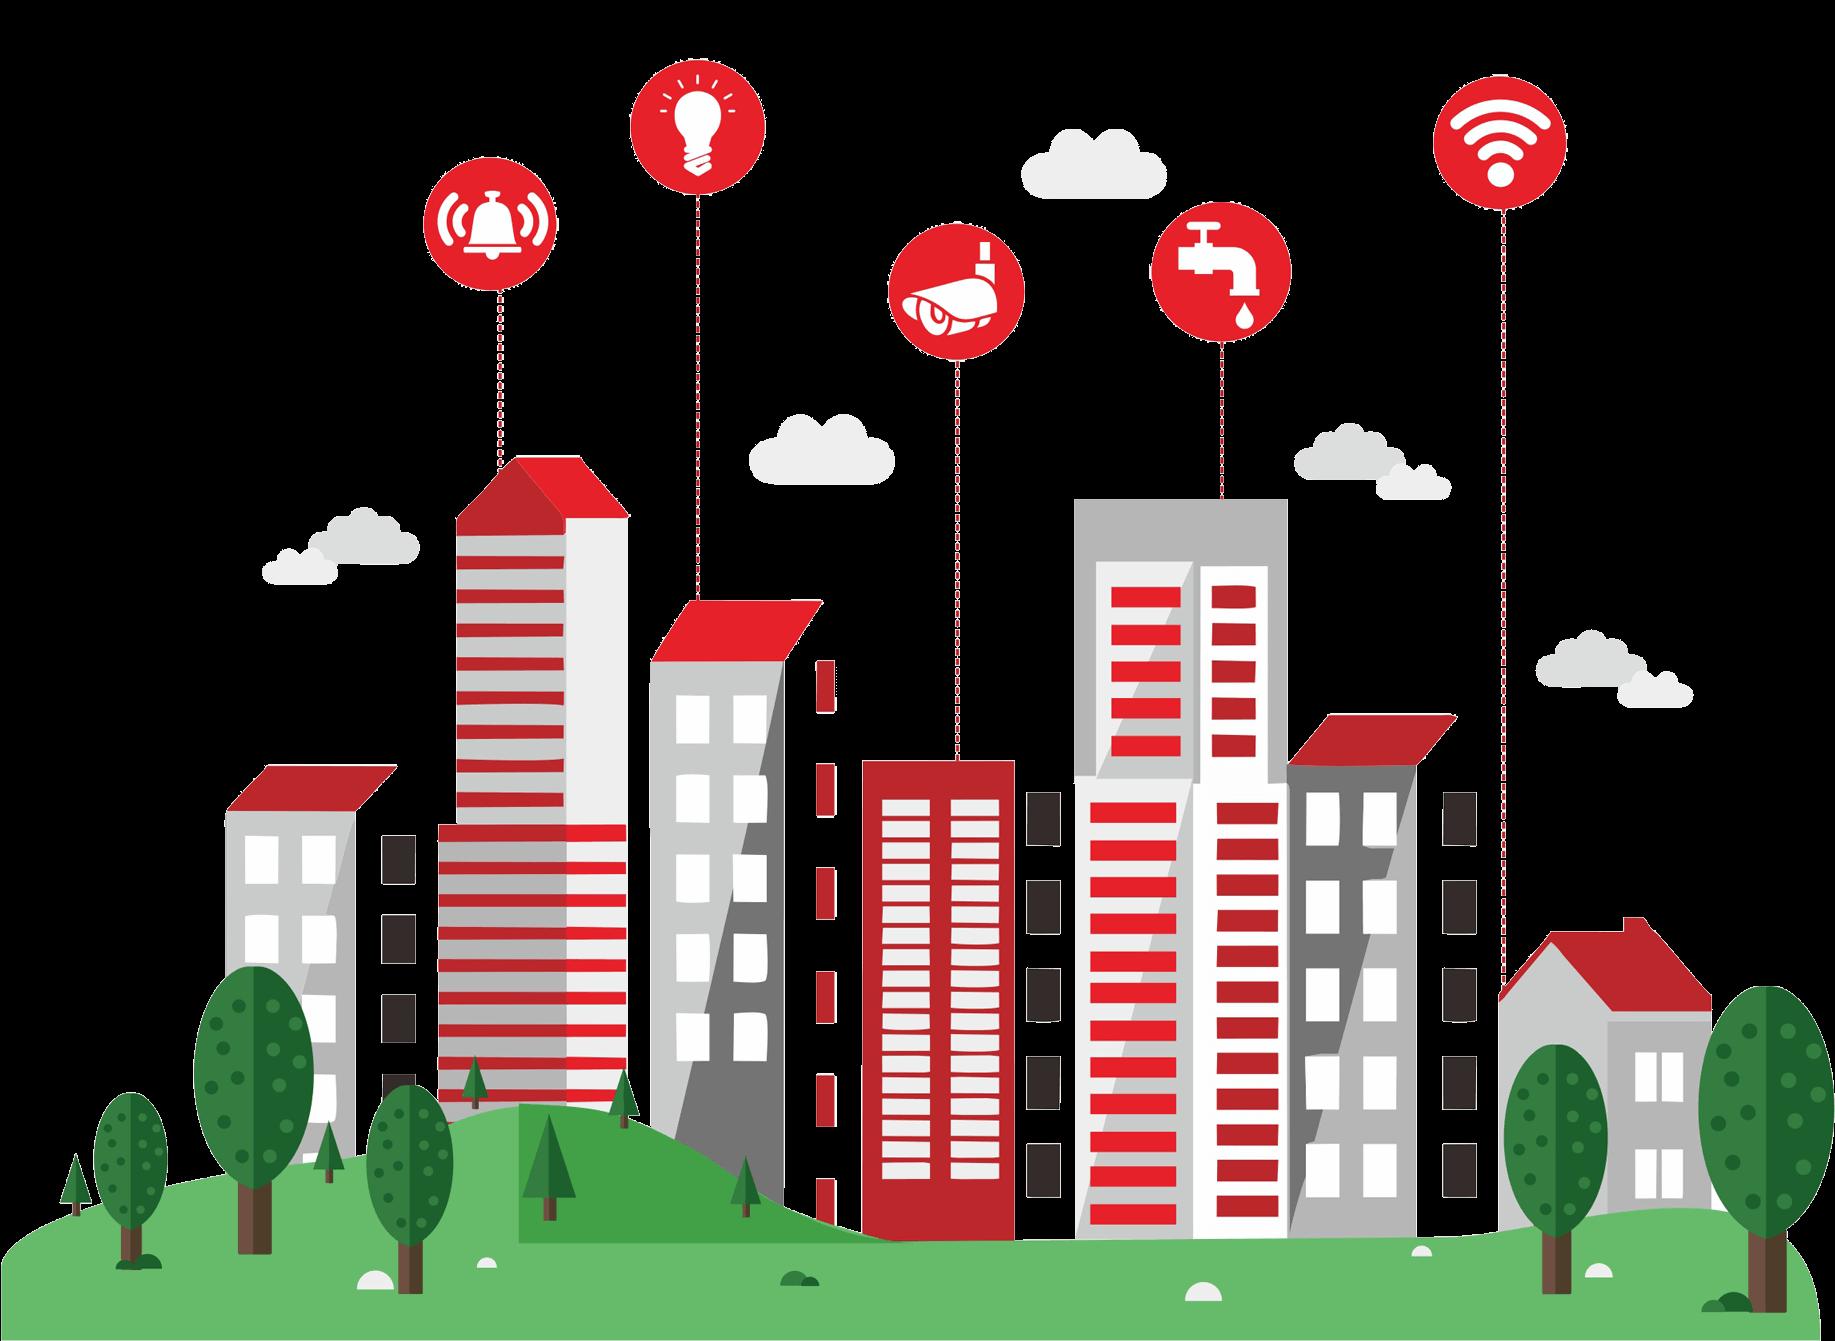 Building automation digitalization transprent. City clipart smart city